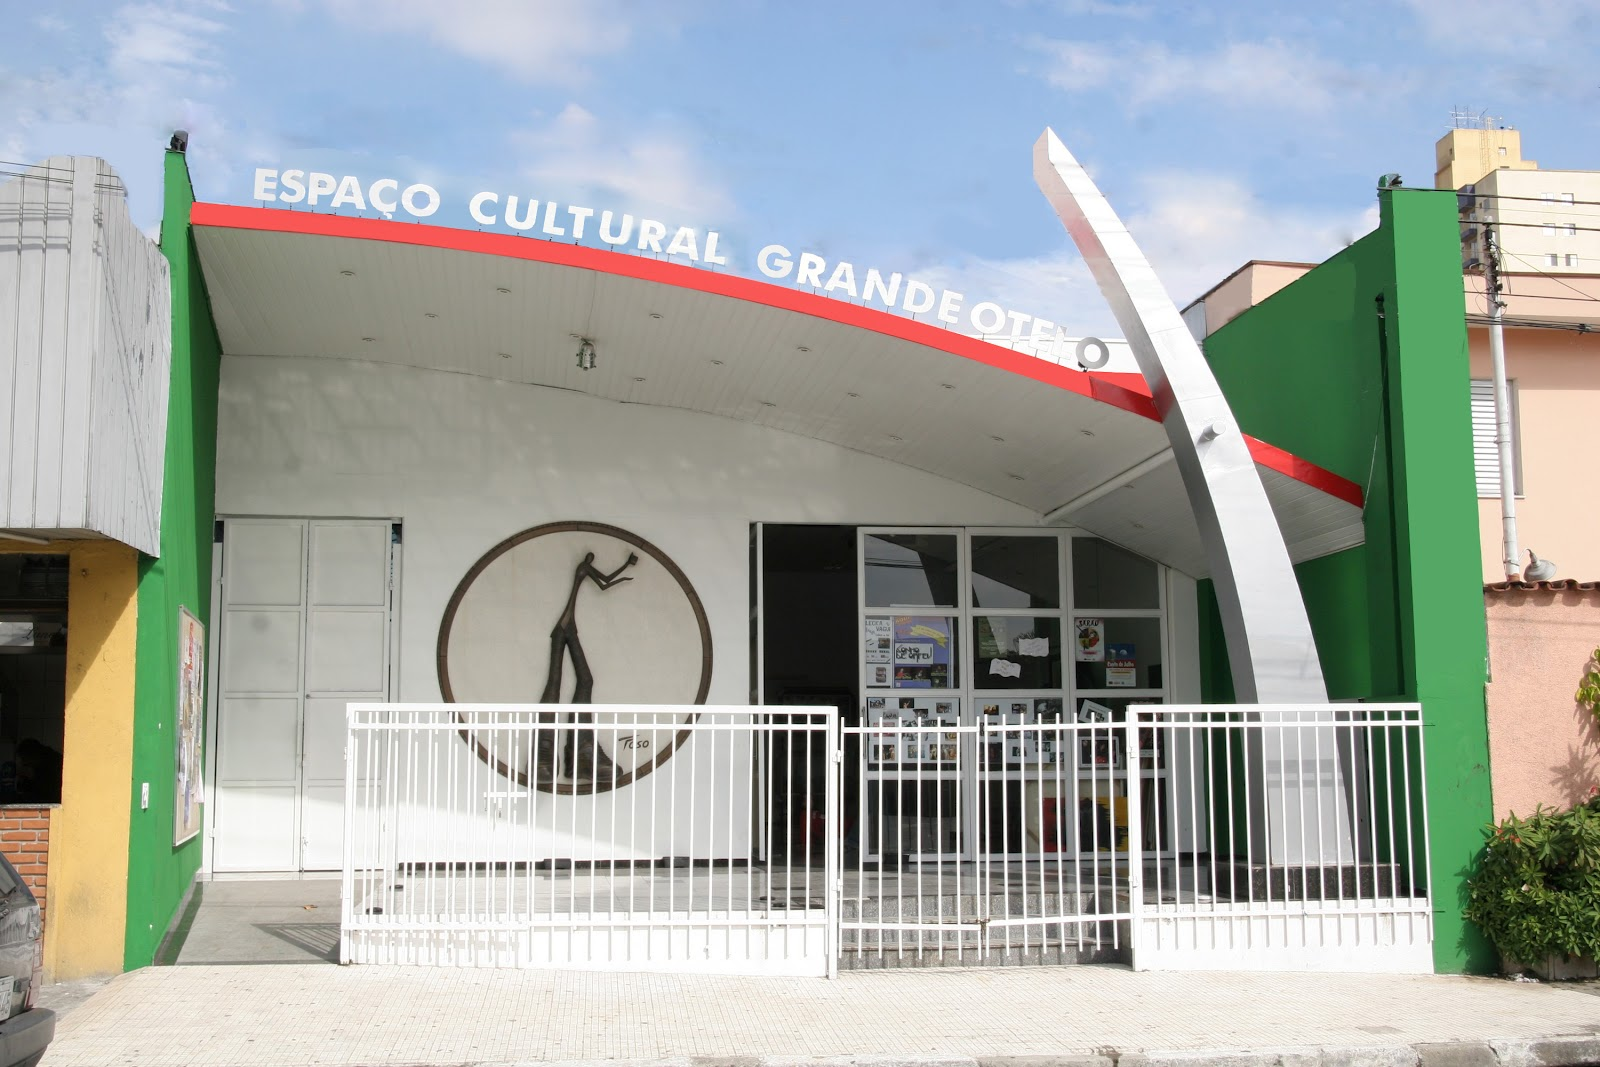 espaco-cultural-grande-otelo-site-cultura-osasco